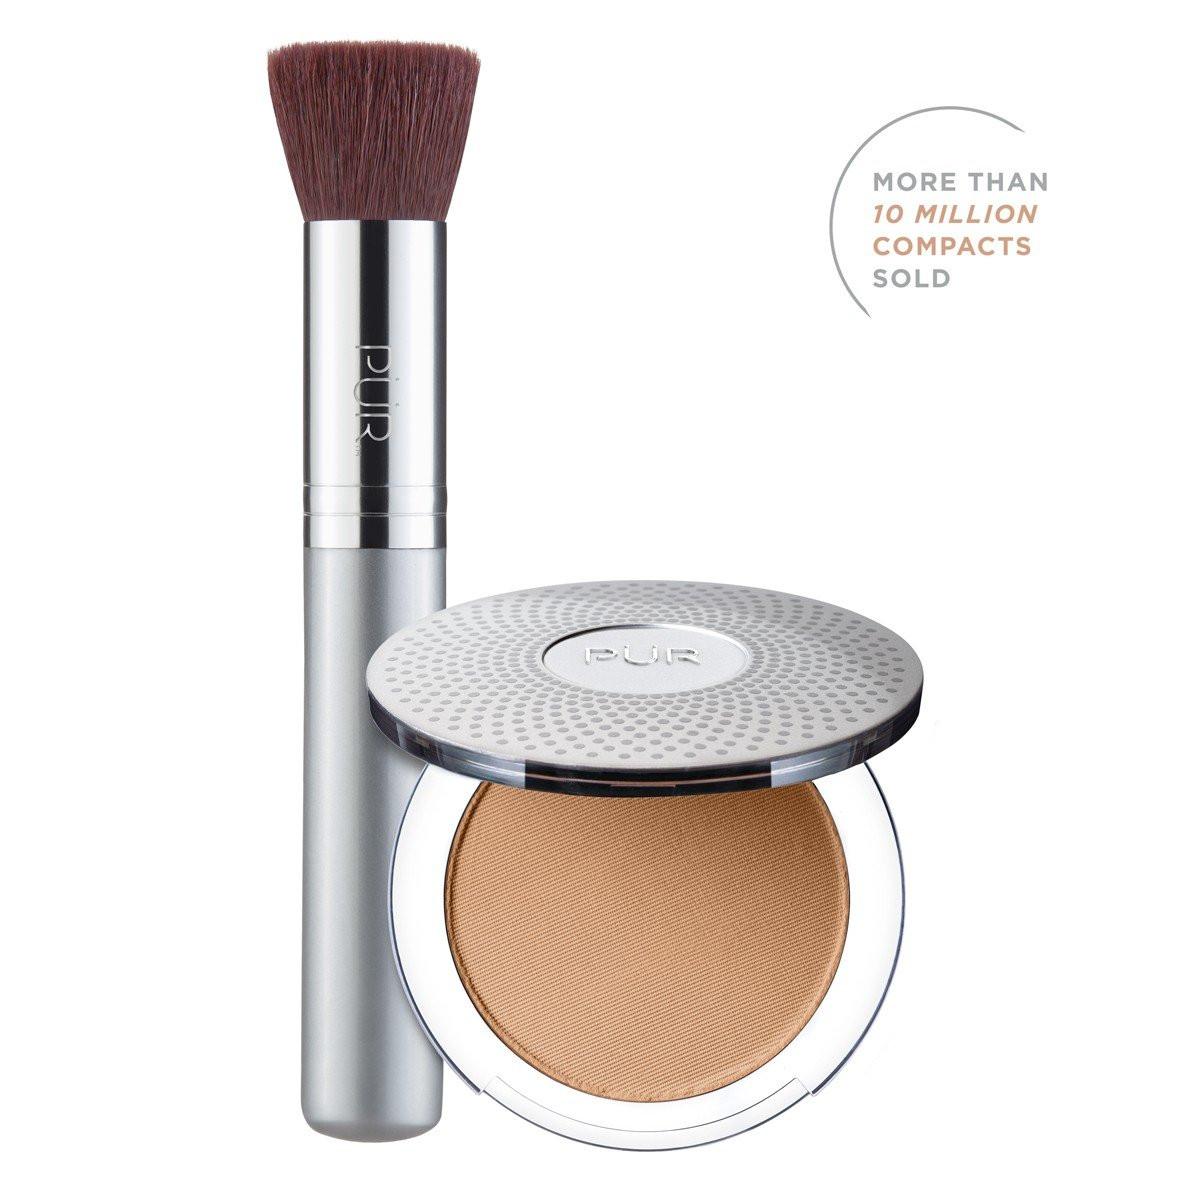 TRY PÜR! 4-in-1 Pressed Mineral Makeup and Brush Kit in Medium Dark